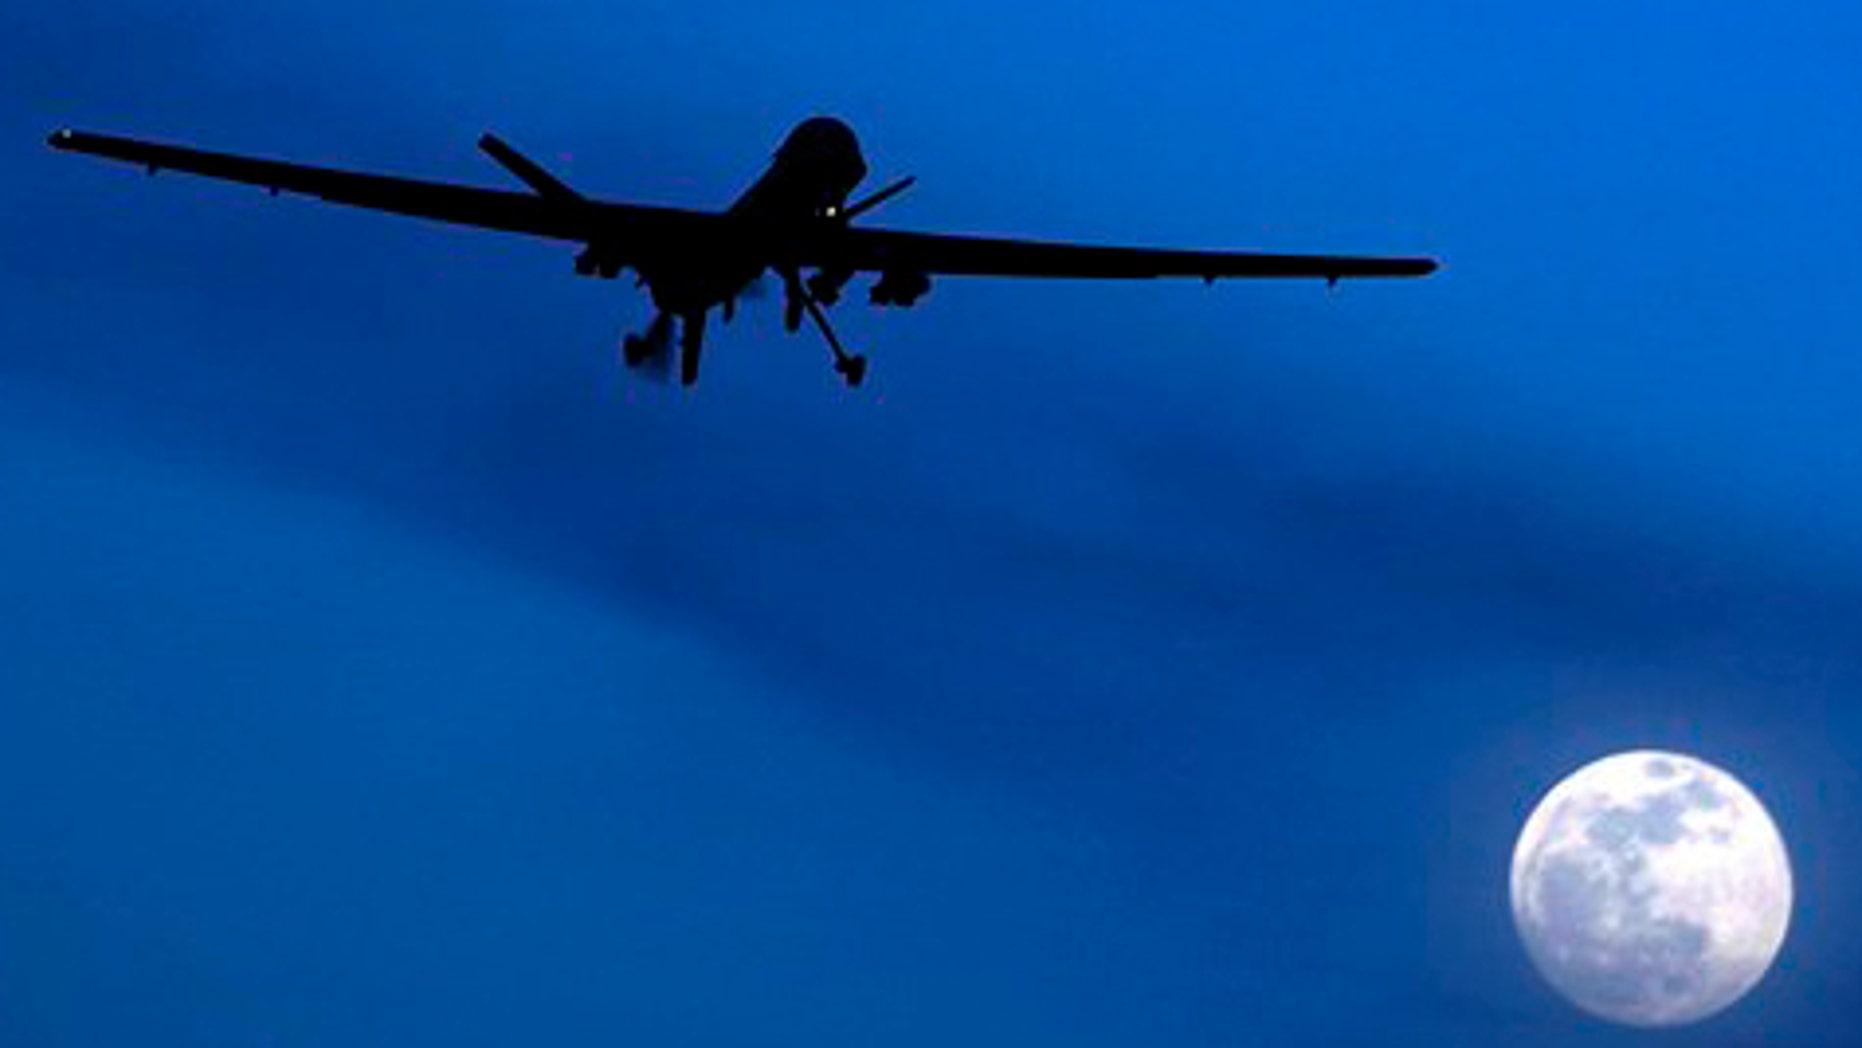 FILE: Jan. 31, 2010: An unmanned U.S. Predator drone flies over Kandahar Air Field on a moon-lit night.